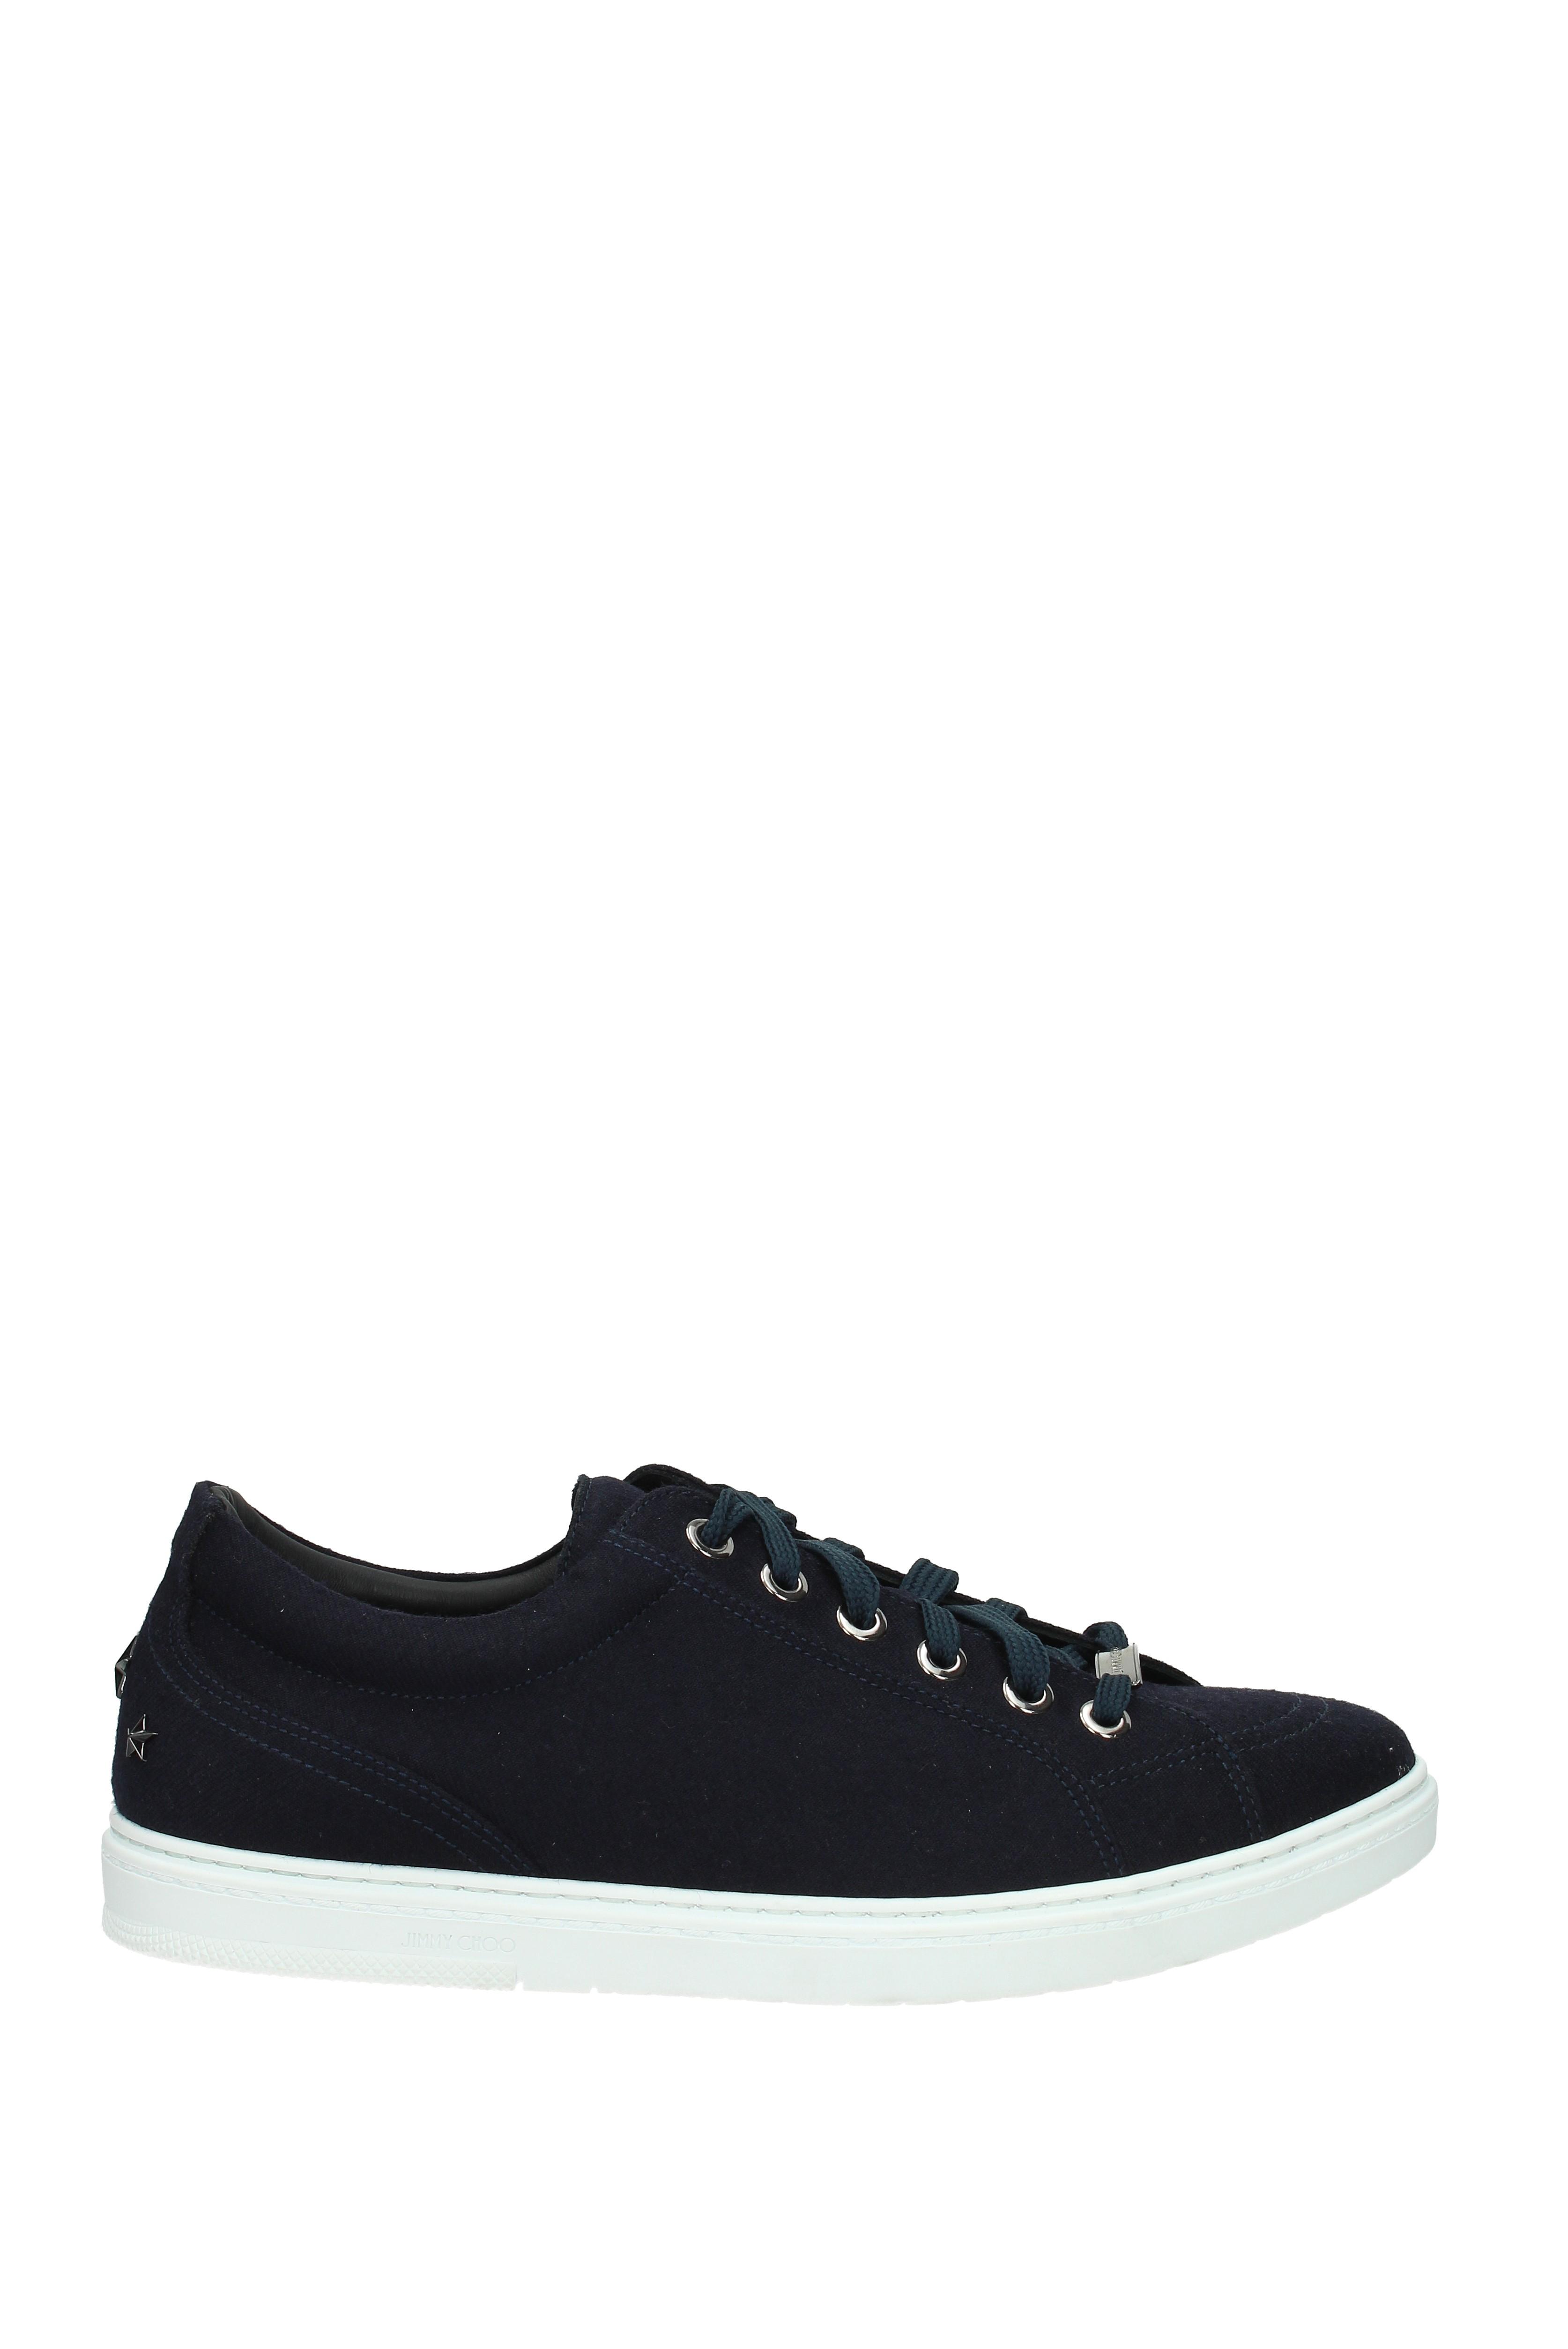 Sneakers Sneakers Sneakers Jimmy Choo cash Herren - Stoff (CASHTESSUTO) e33fe9